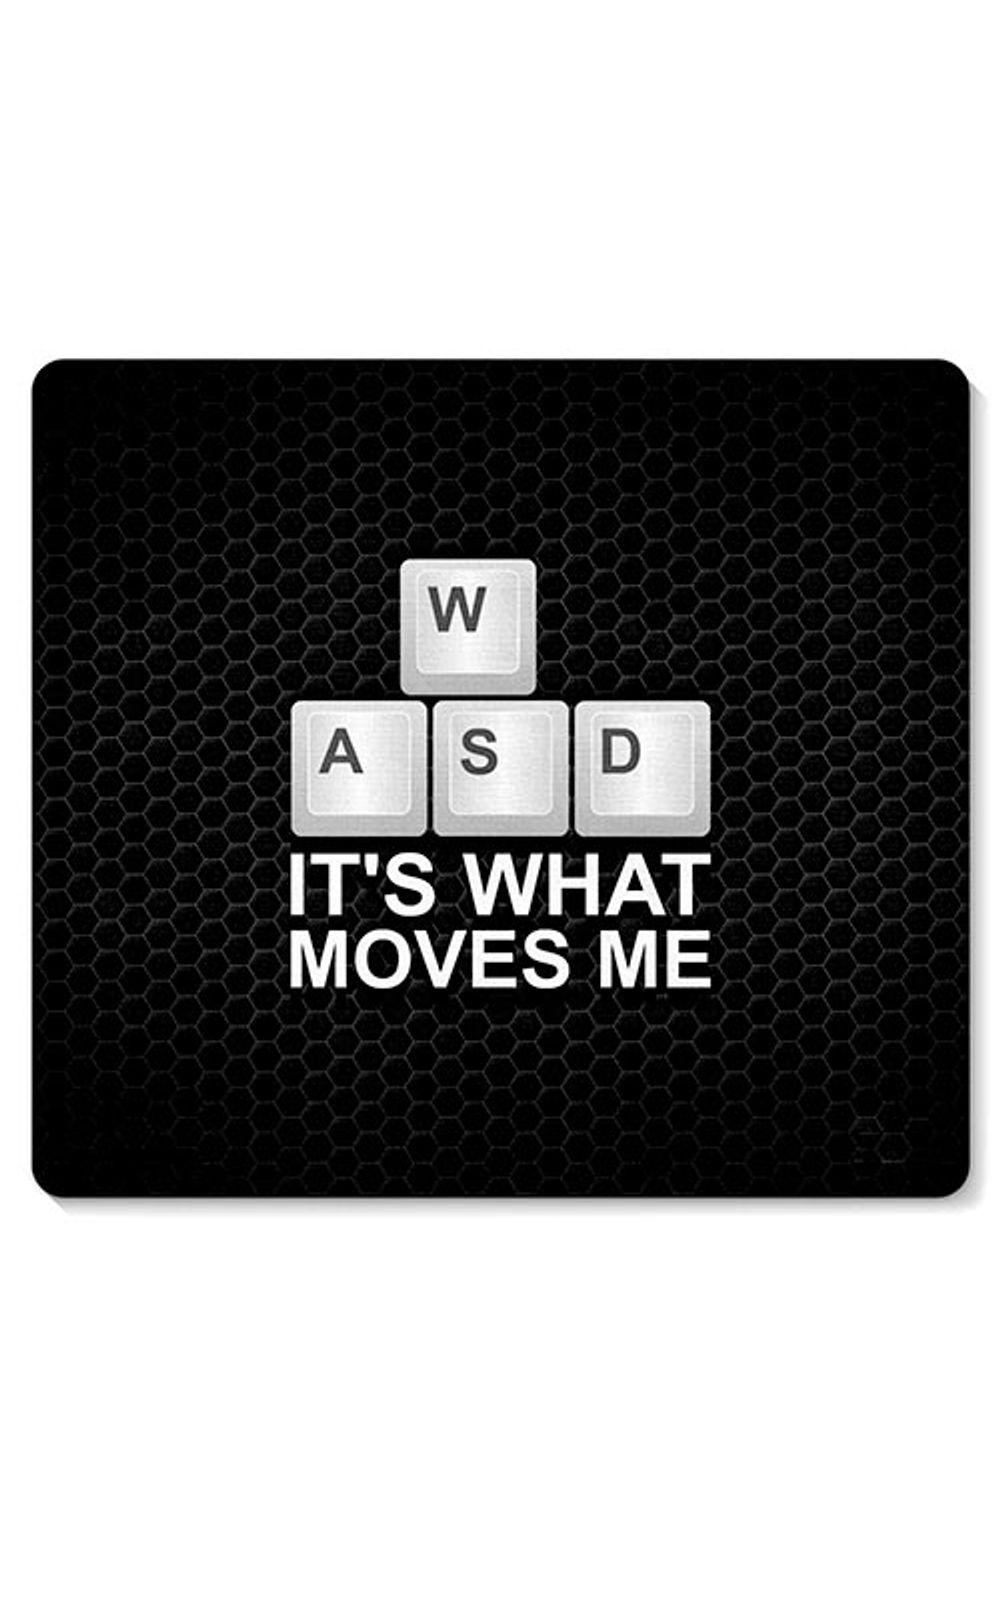 Foto 1 - Mouse Pad Joystick PC Computador WASD Its What Moves Me